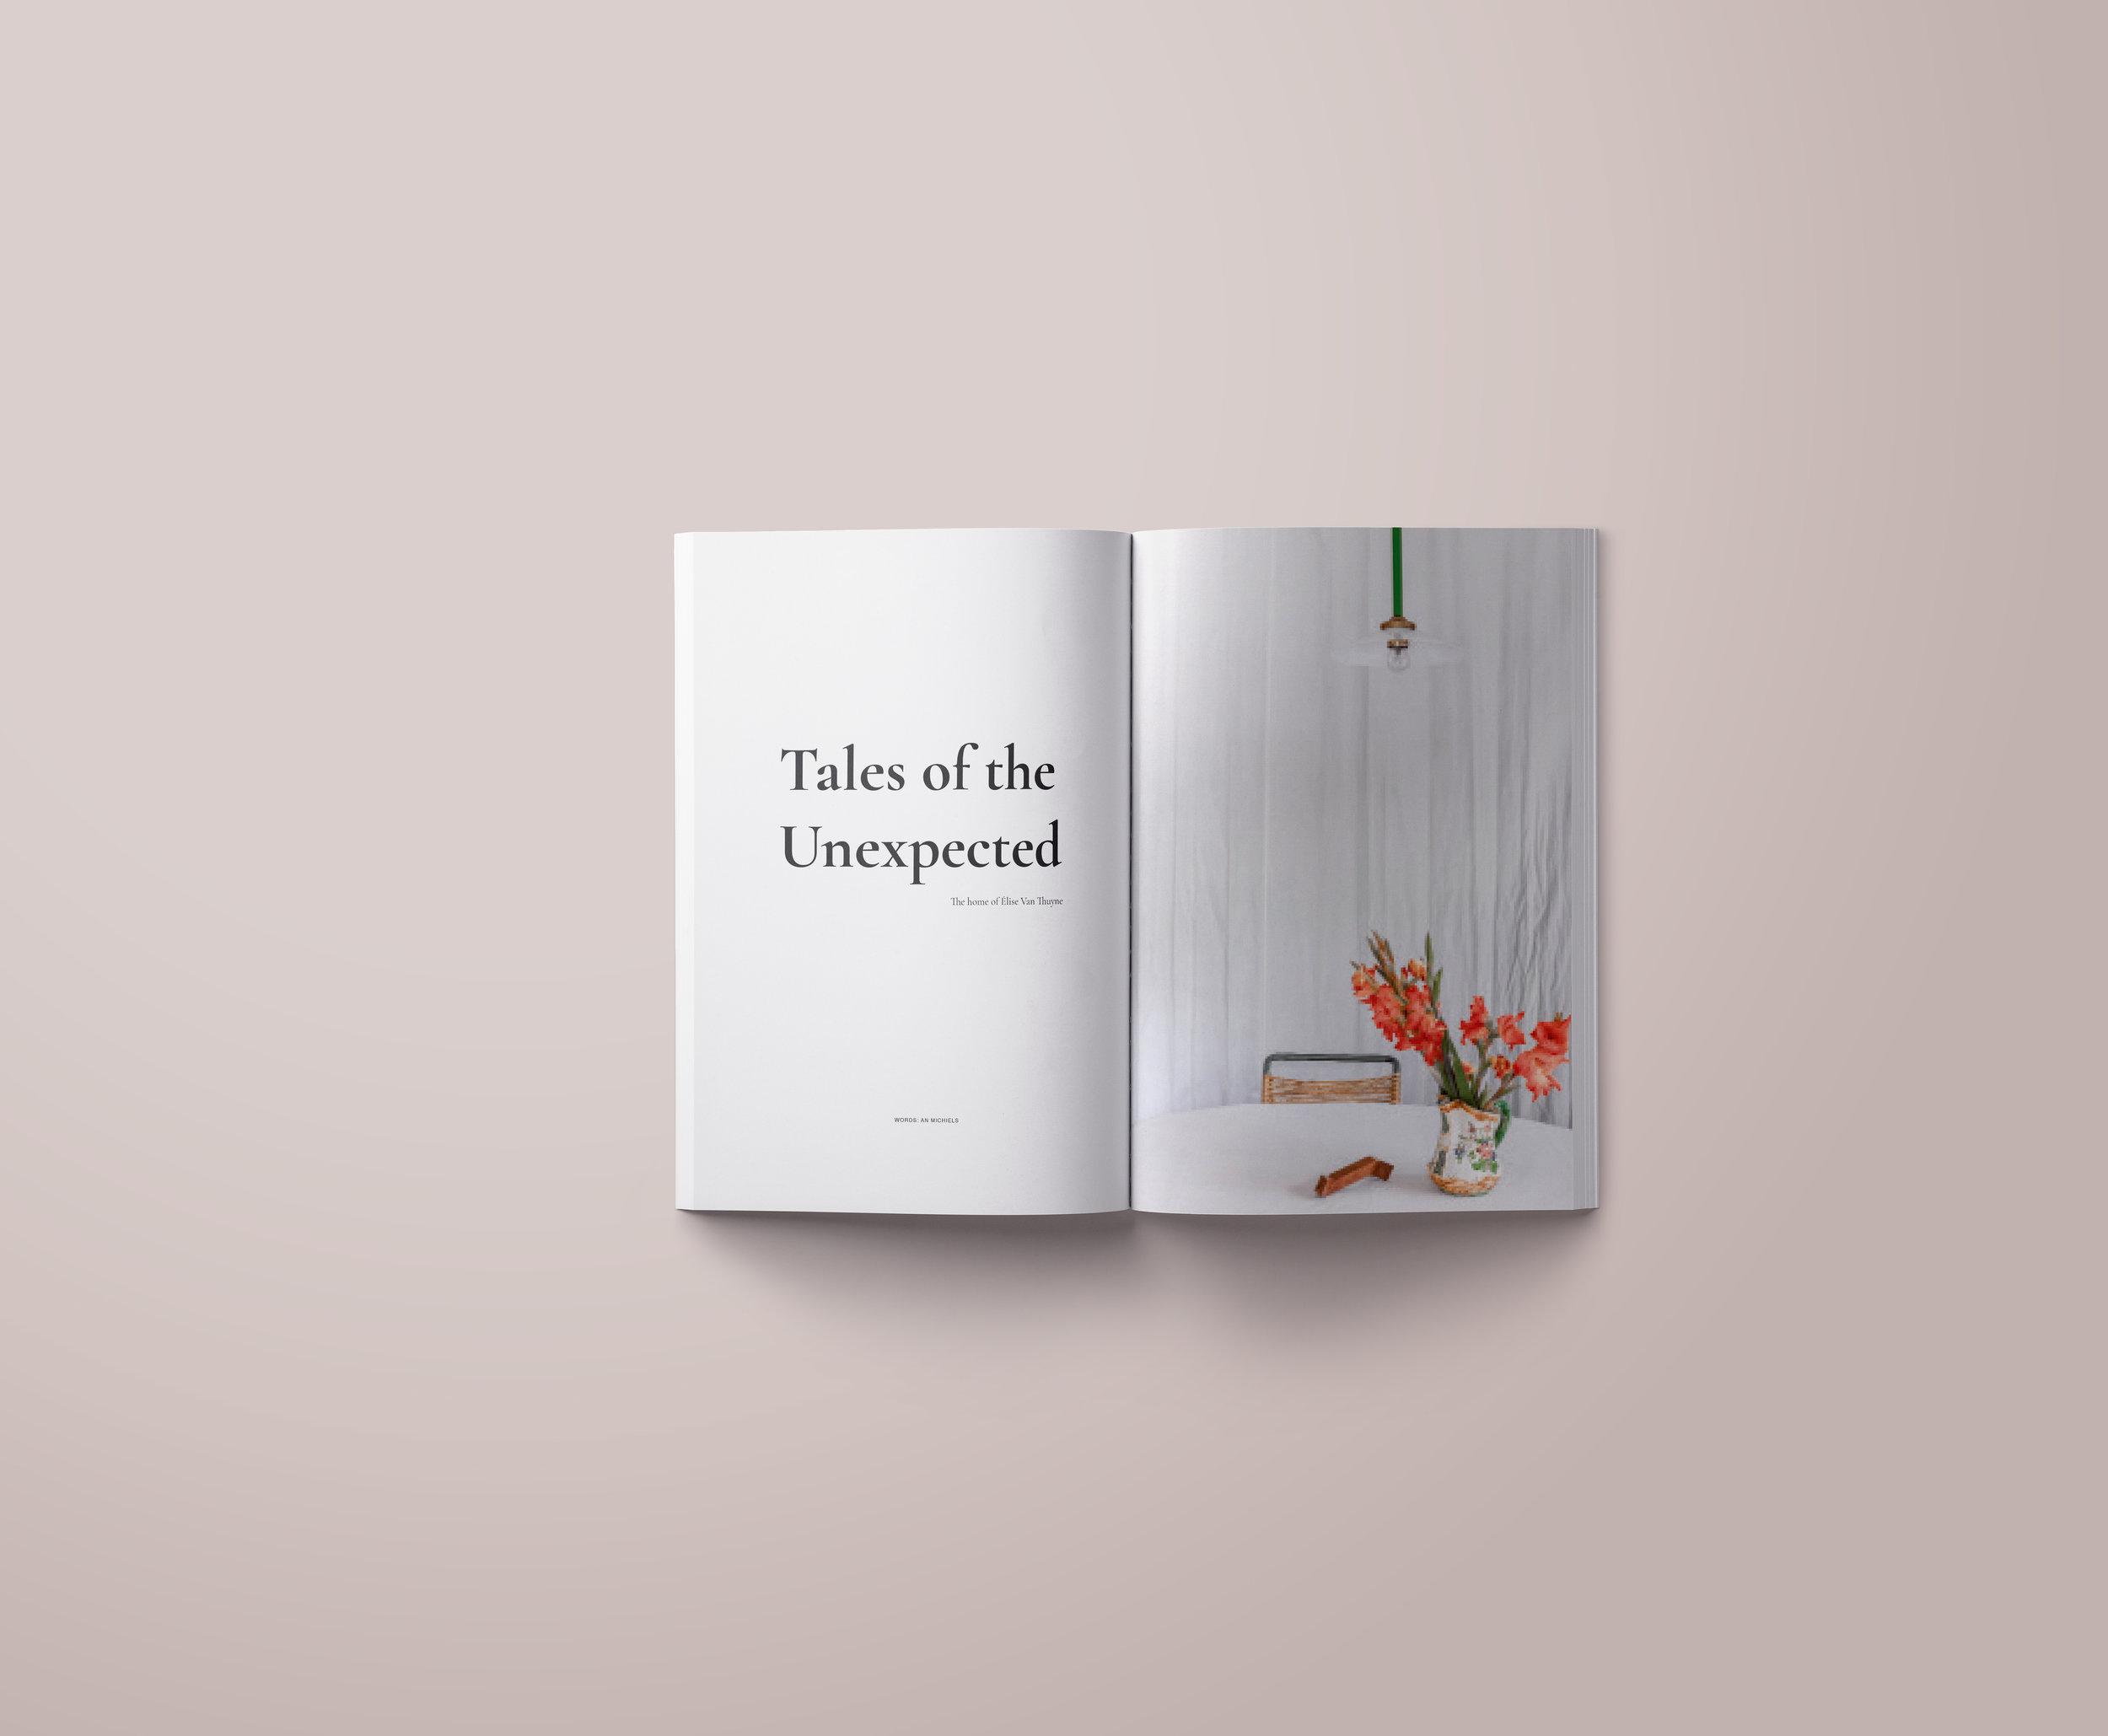 AKT magazine